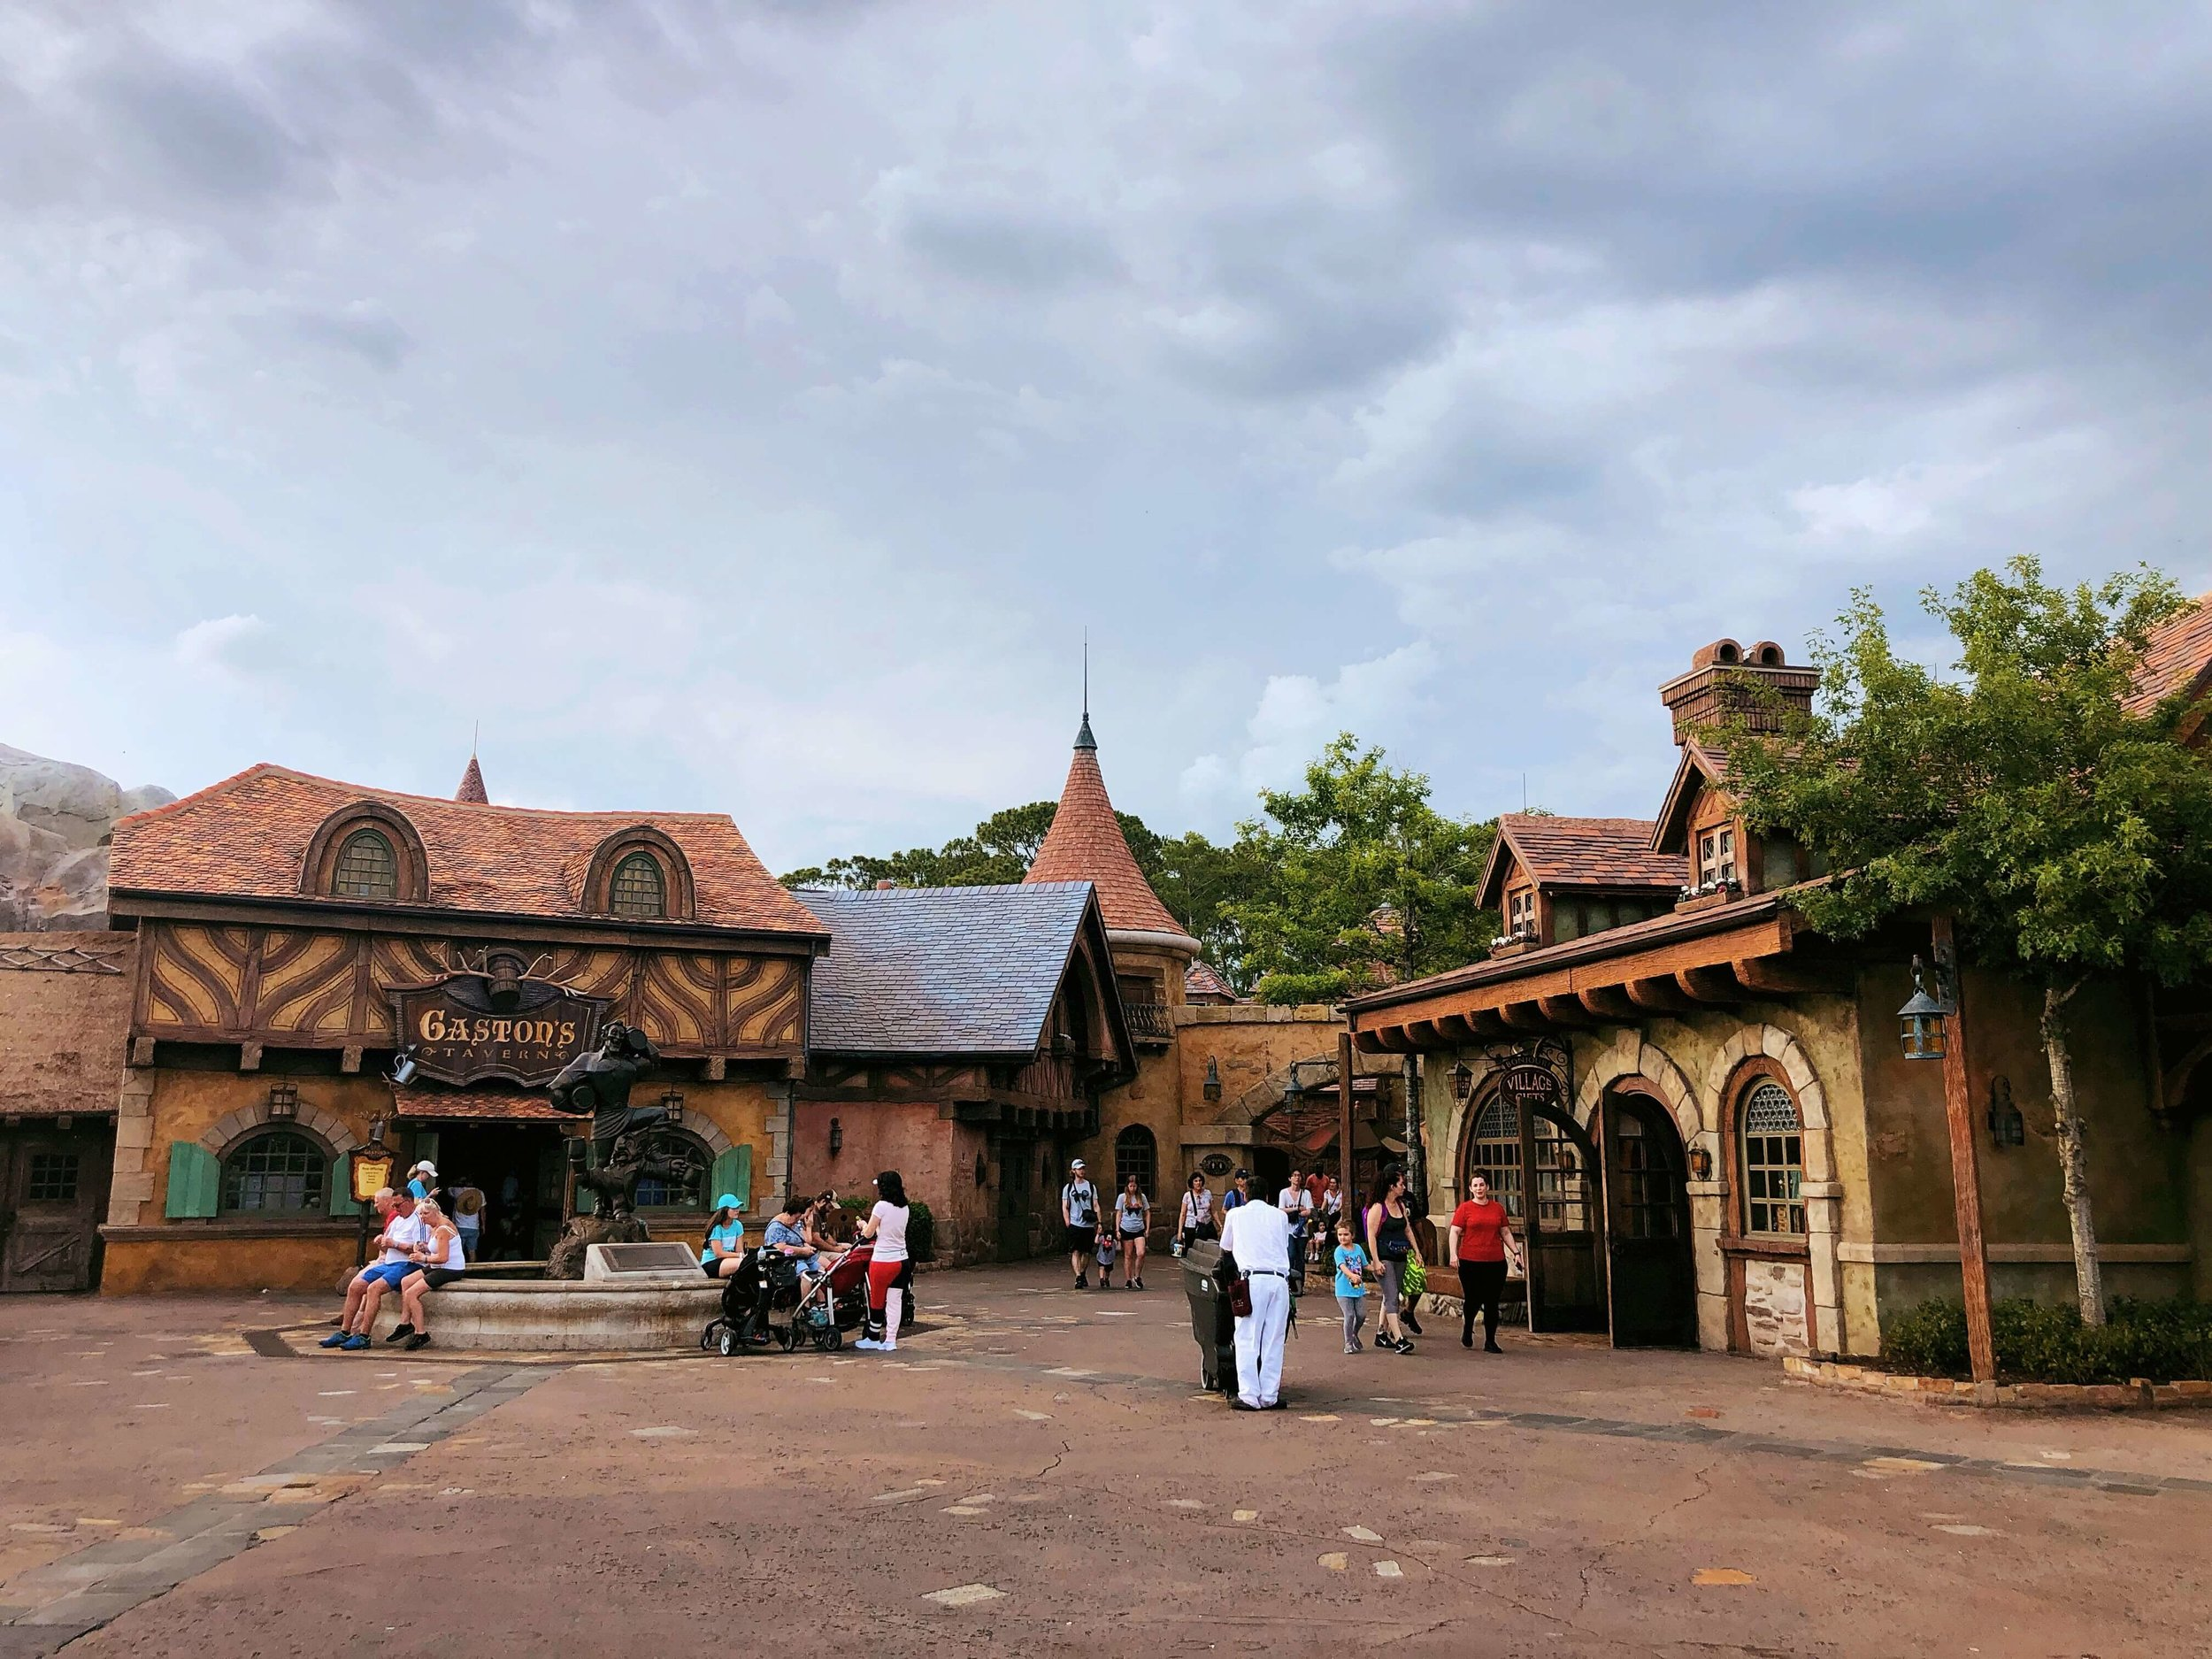 Gaston's Tavern Magic Kingdom